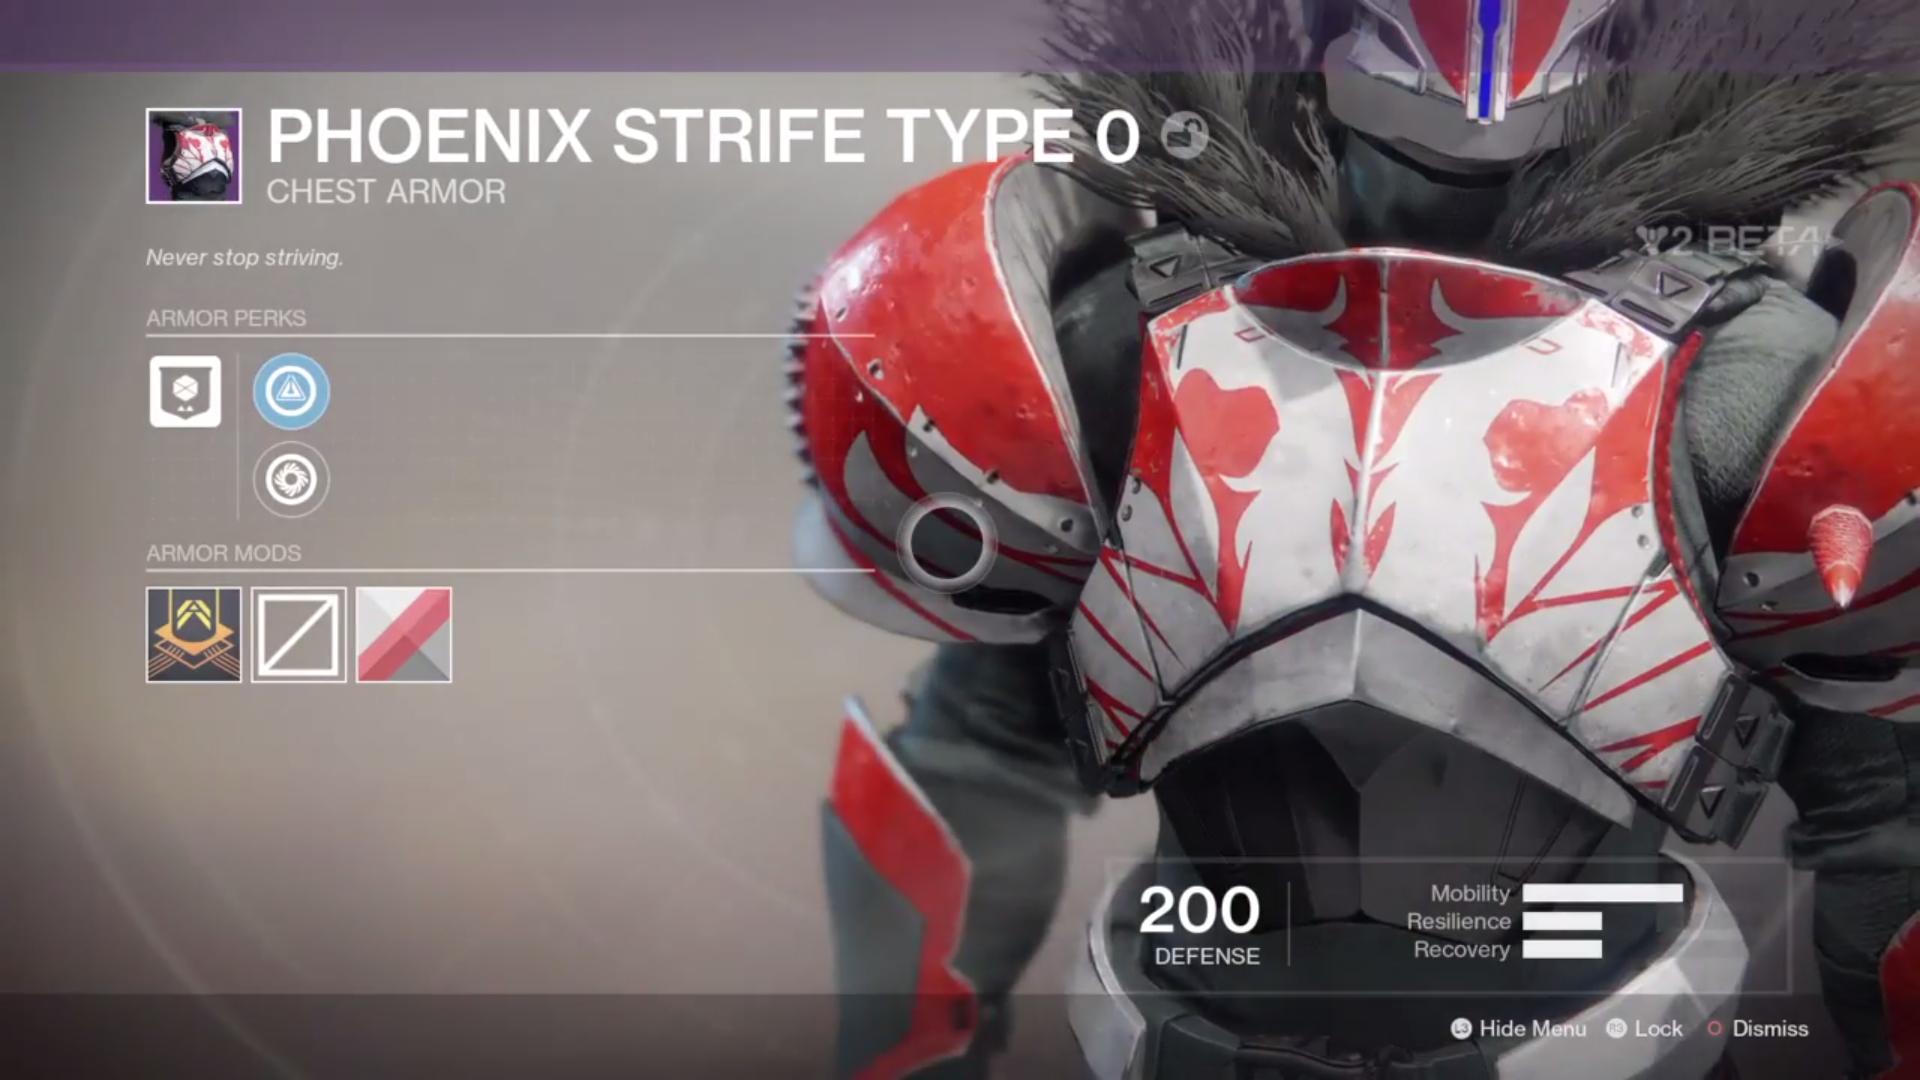 destiny 2 beta phoenix strife type 0 chest